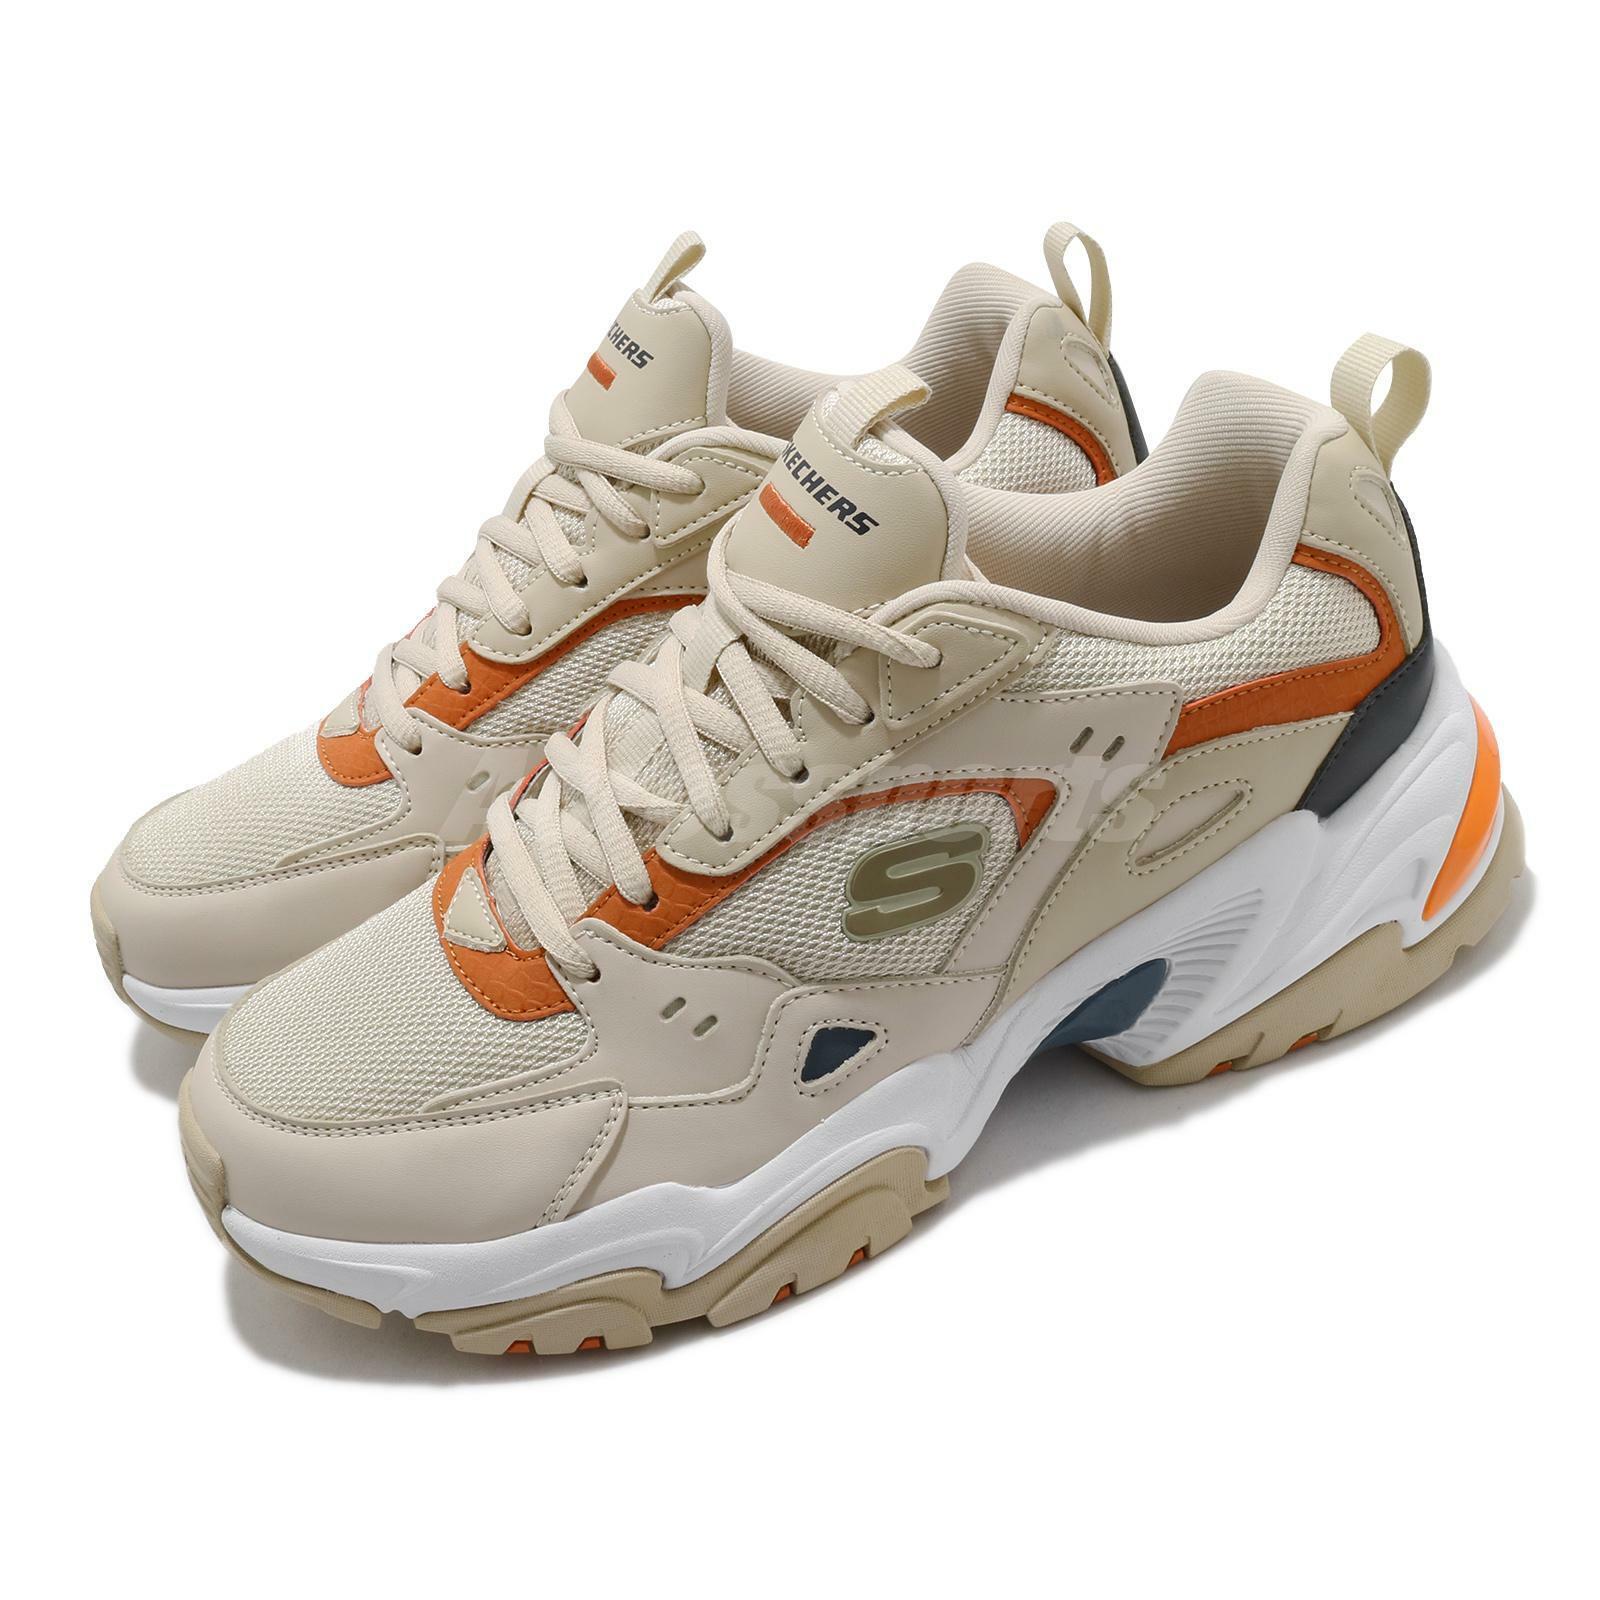 Skechers Stamina V2 Taupe White Orange Men Casual Lifestyle Shoes 237163-TPE